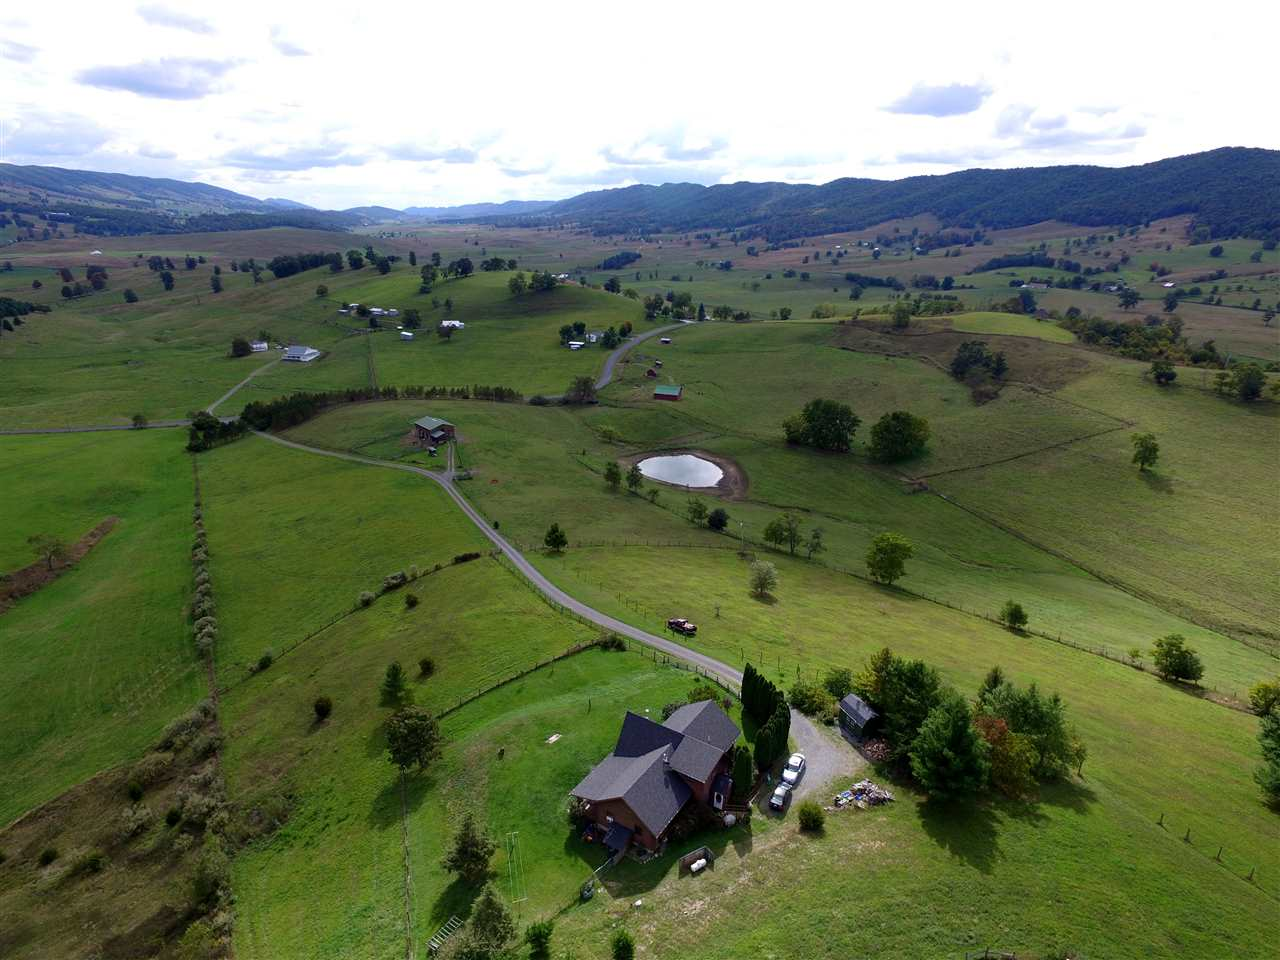 770 HARDSCRABBLE RD, BLUE GRASS, VA 24413